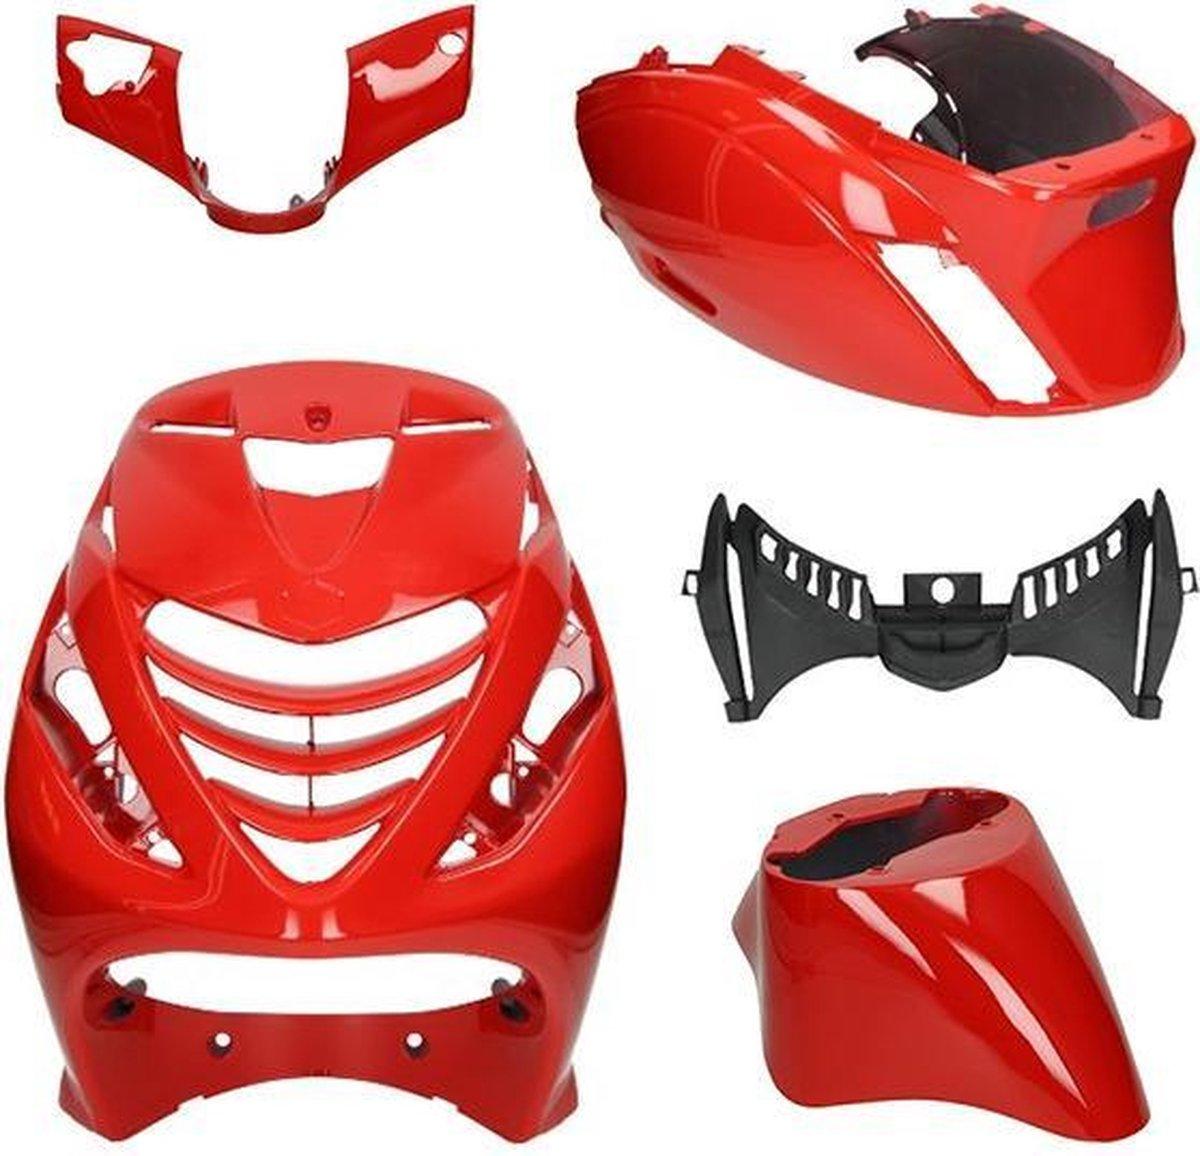 Kappenset Piaggio Zip Sp Ferrari glans rood DMP 5-delig